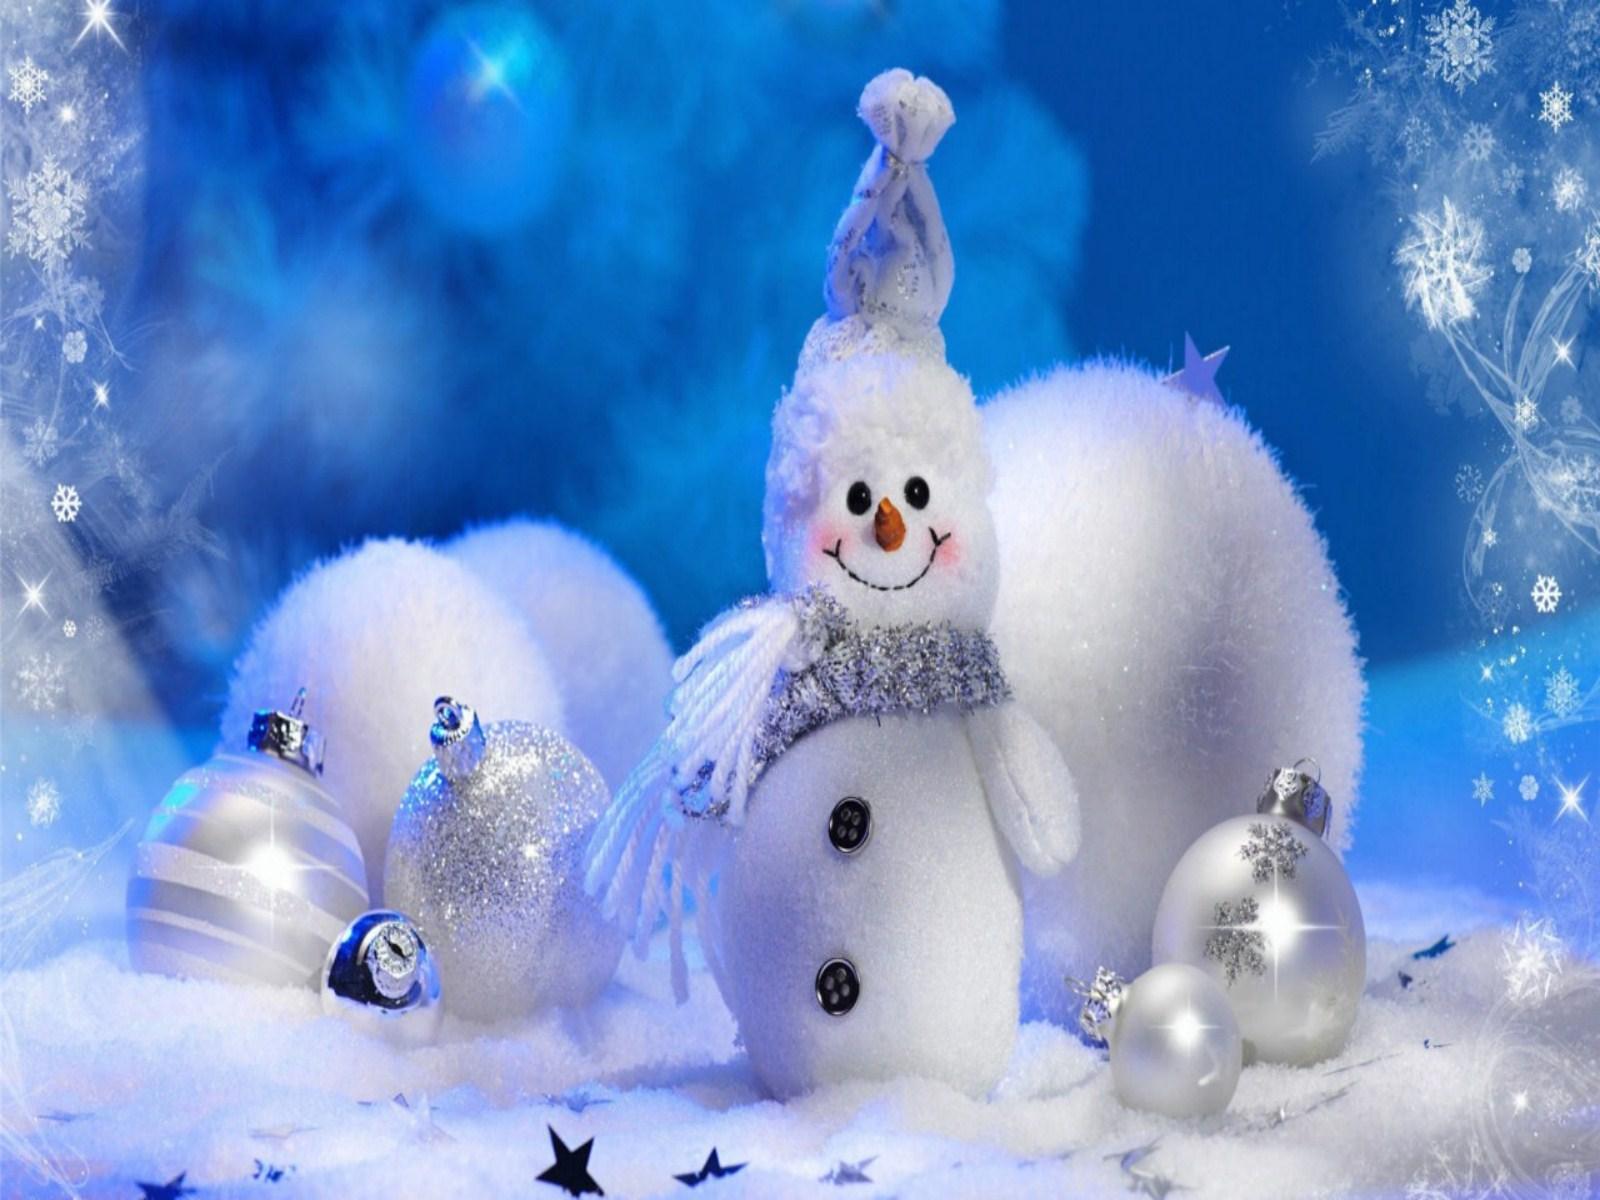 Cute Christmas Wallpaper   1600x1200   280683 1600x1200